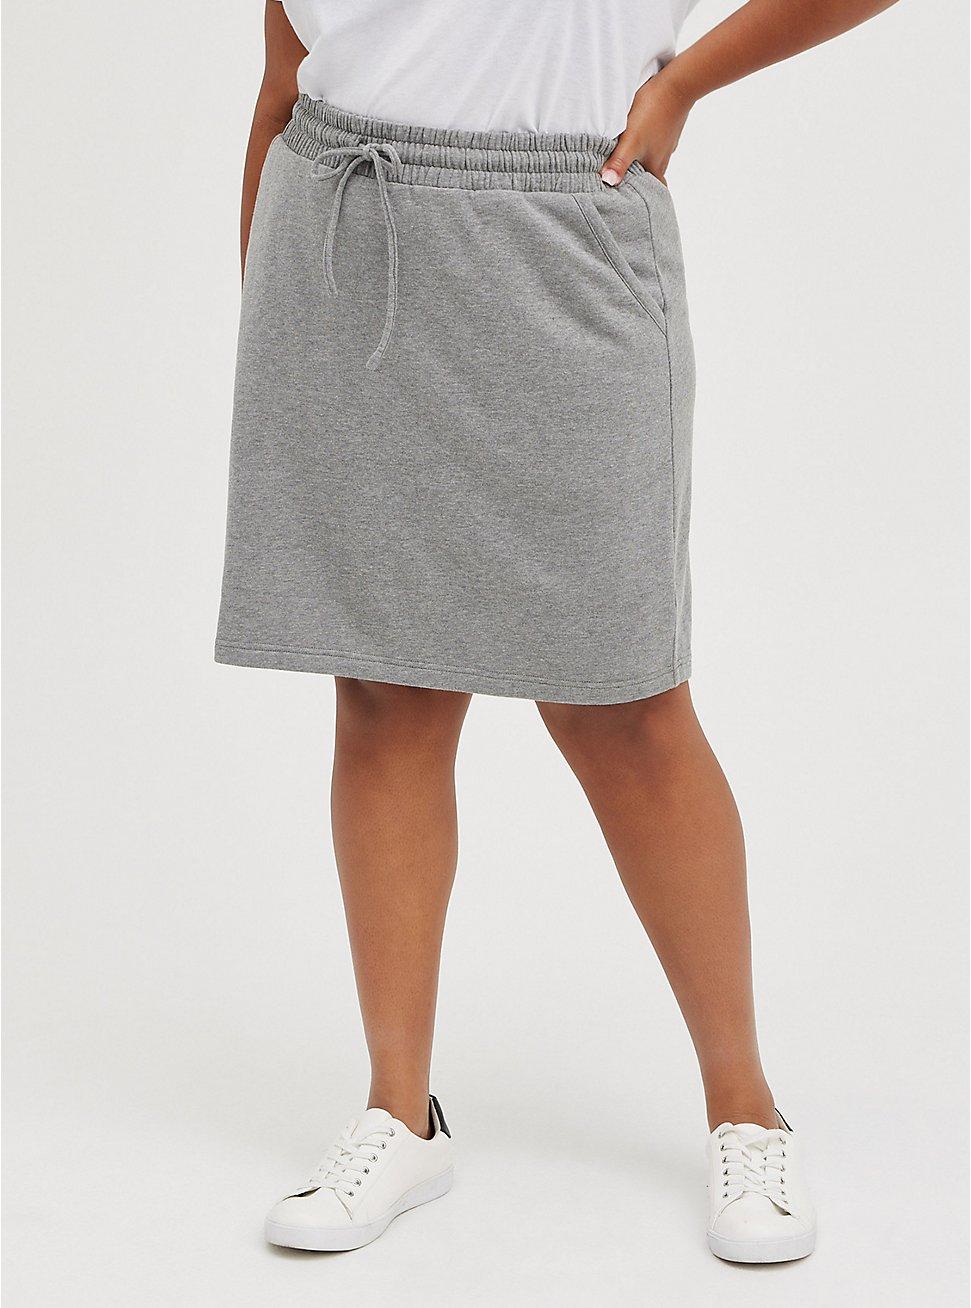 Plus Size A-Line Mini Skirt - Fleece Grey, HEATHER GREY, hi-res